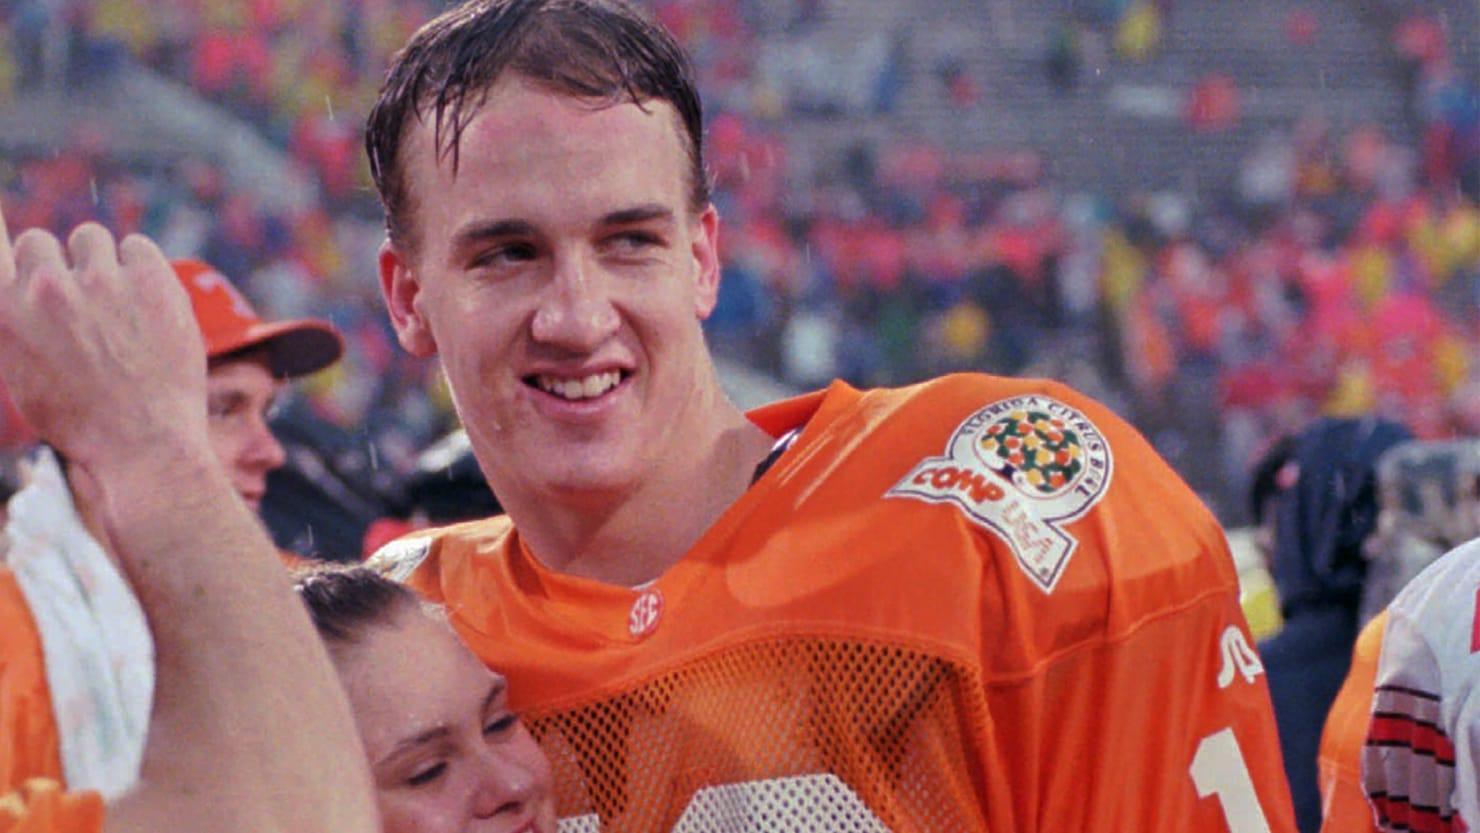 El engaño de Peyton Manning